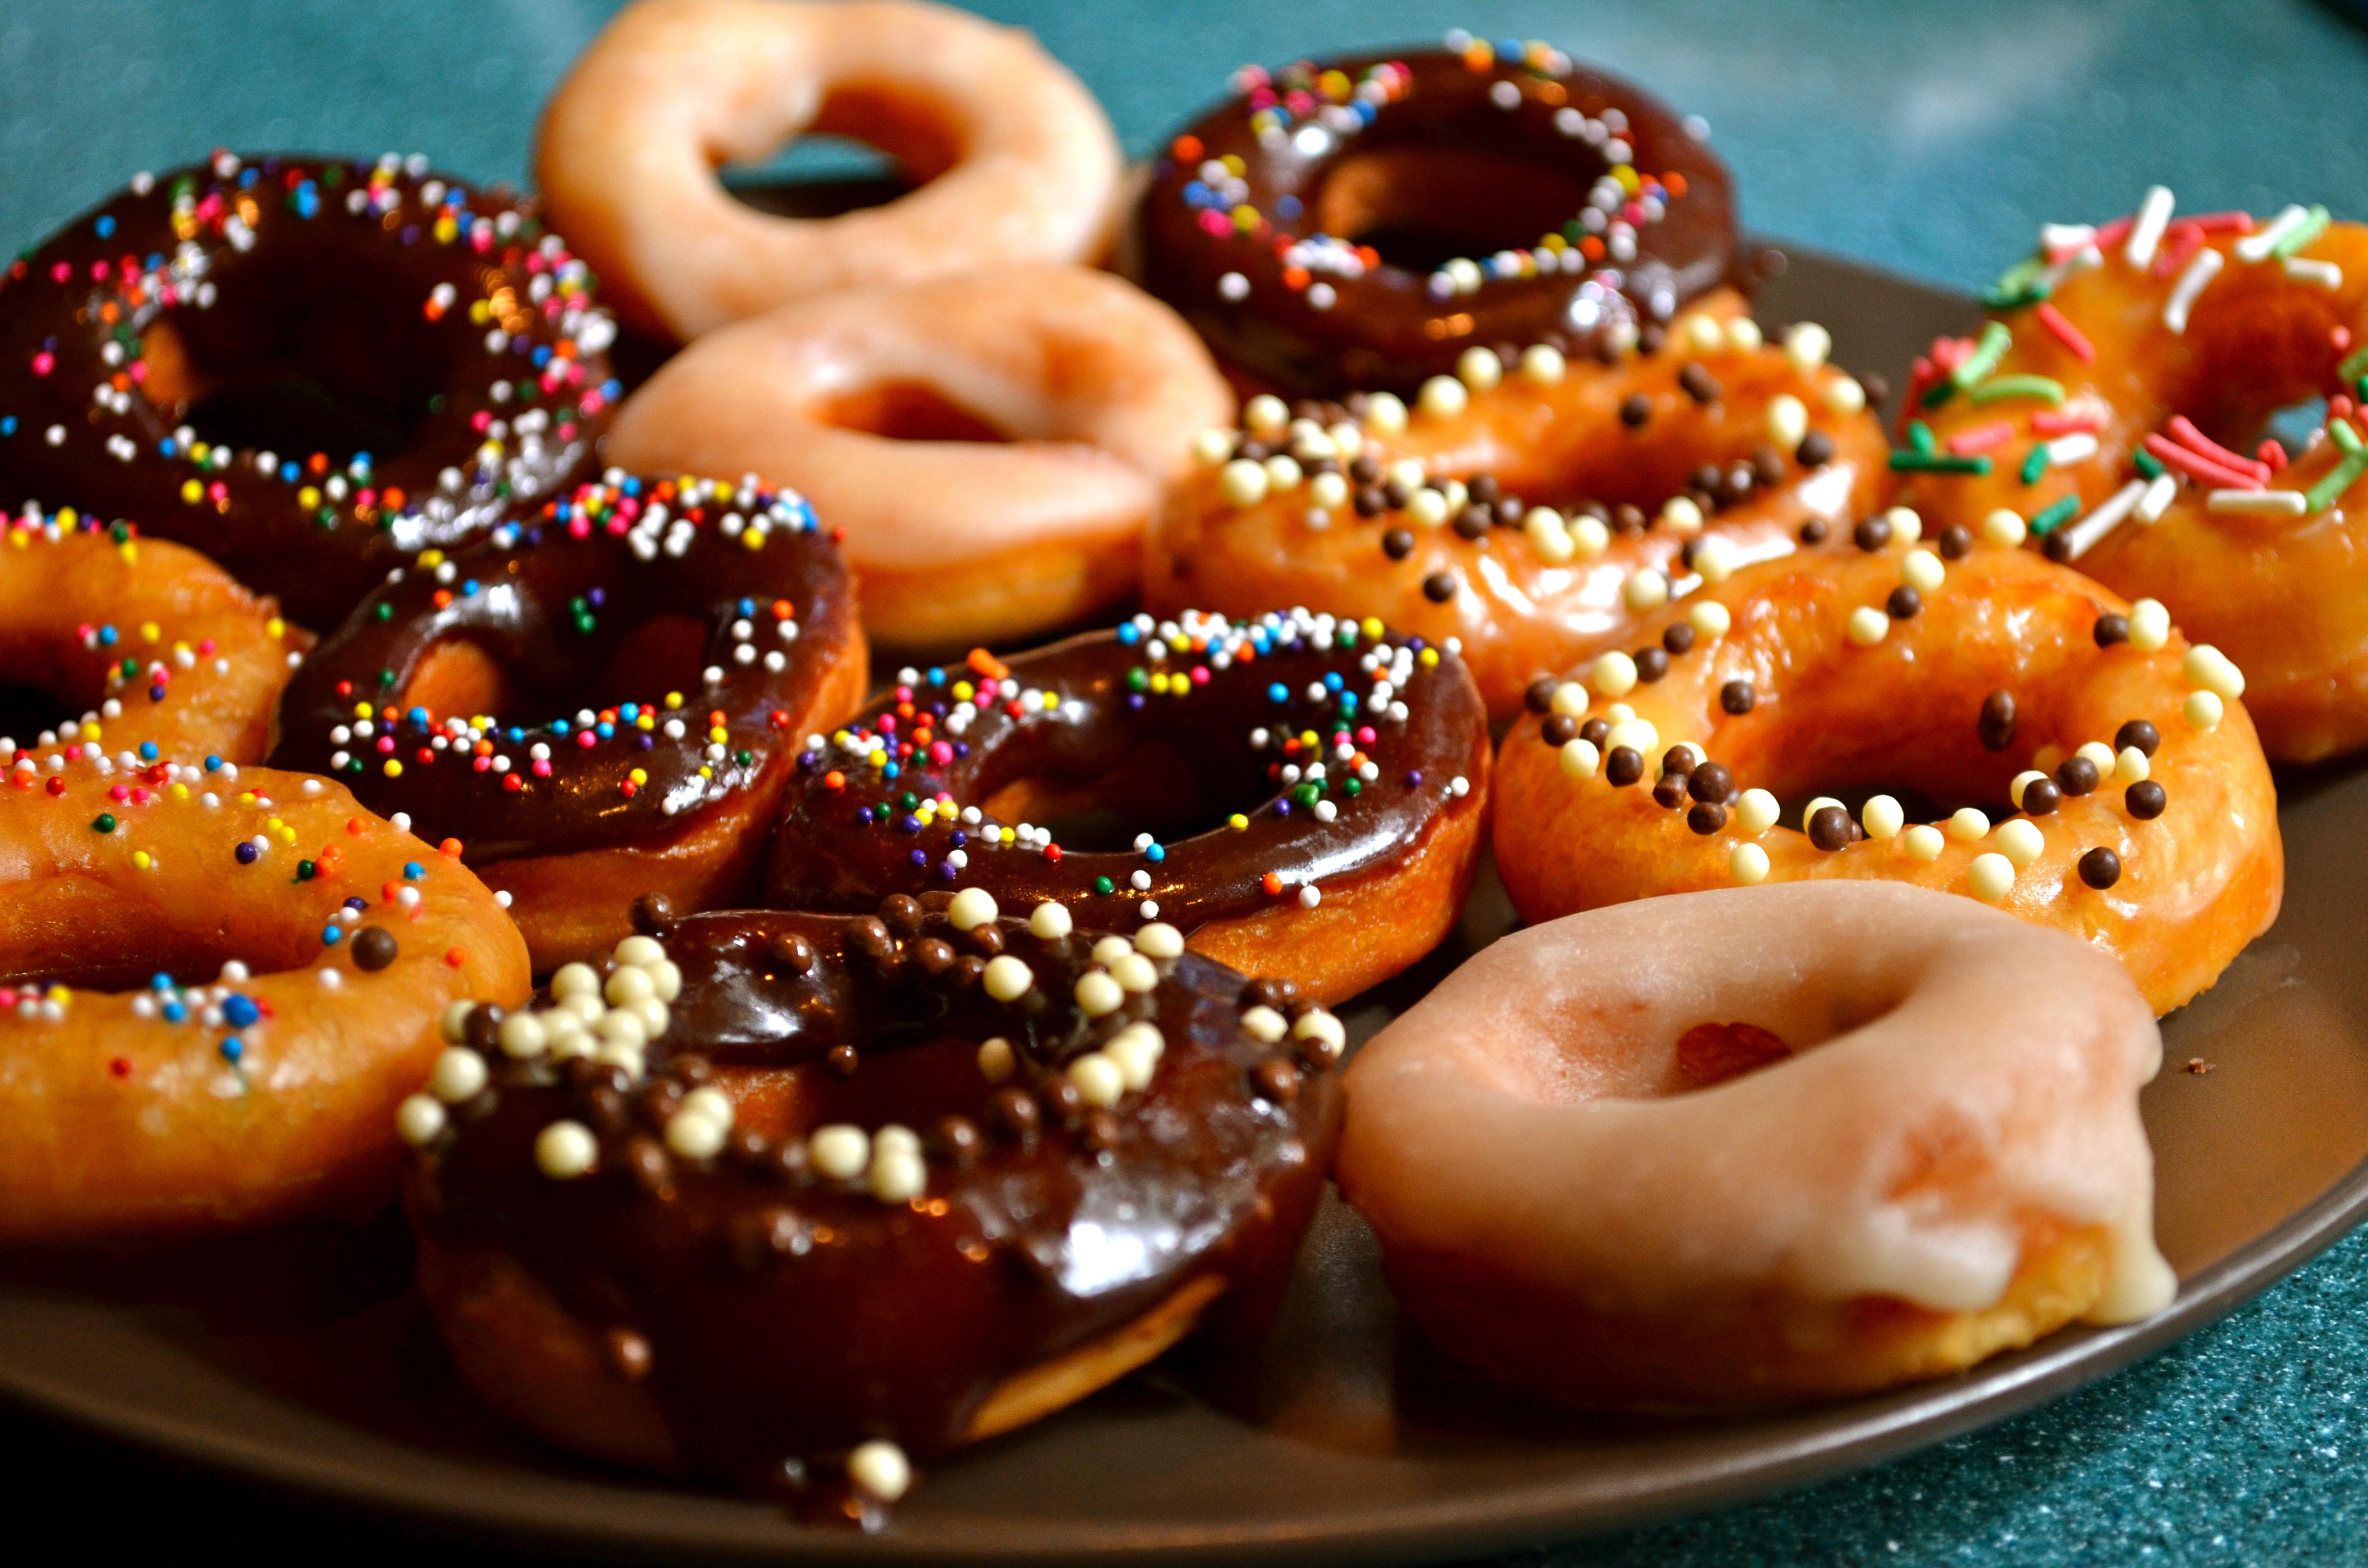 Images of Doughnut | 4928x3264